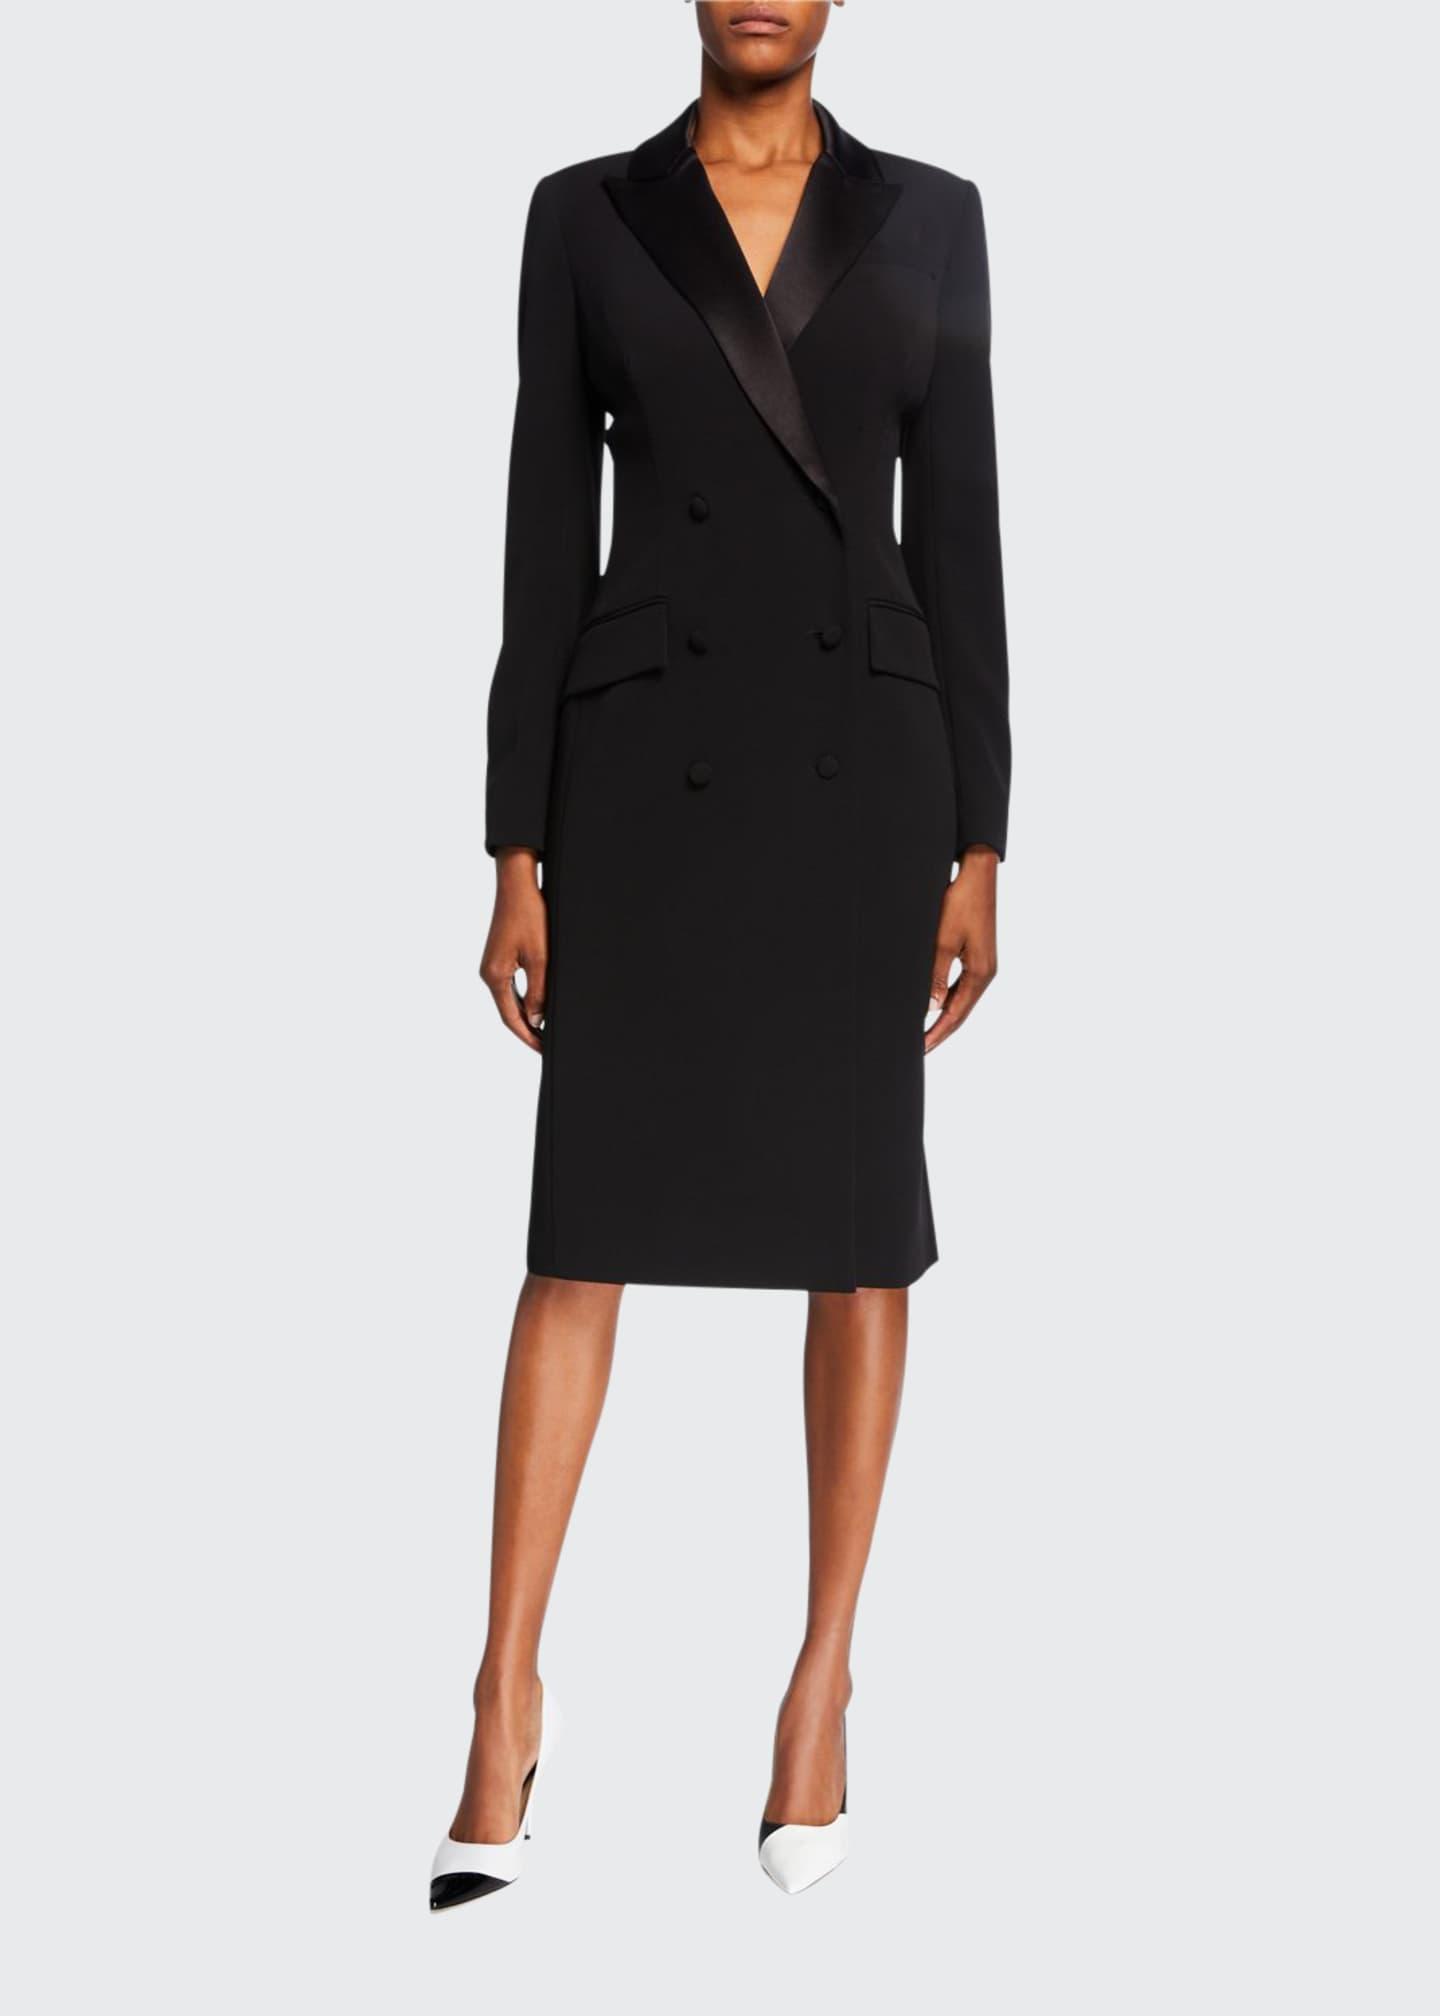 Double Breasted Tuxedo Coat Dress by Rickie Freeman For Teri Jon